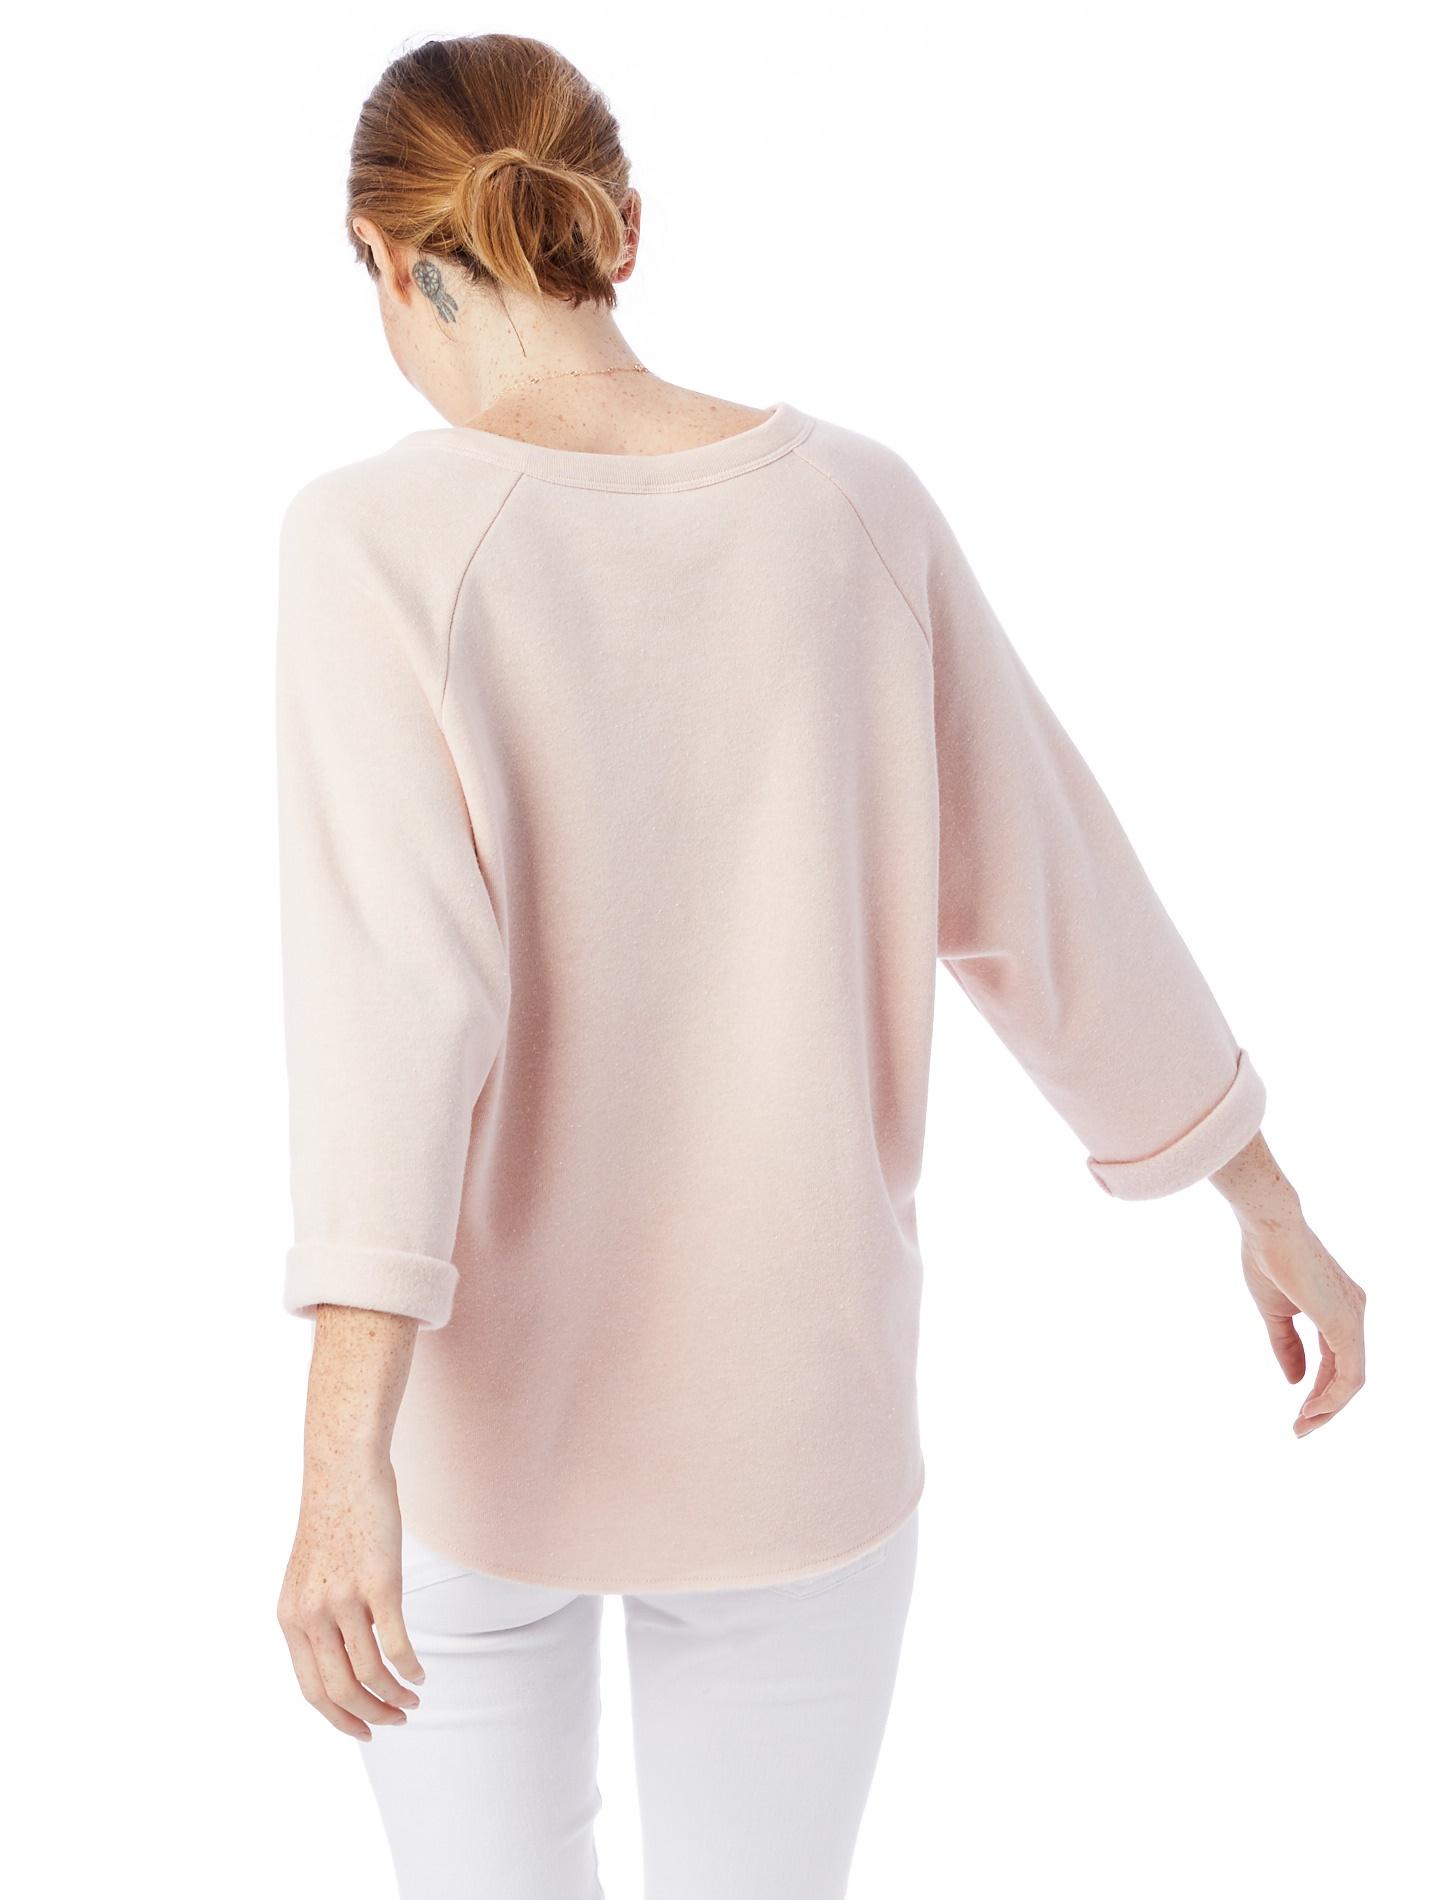 Champ Remix Eco-Fleece Sweatshirt in Eco Peach (2).jpg